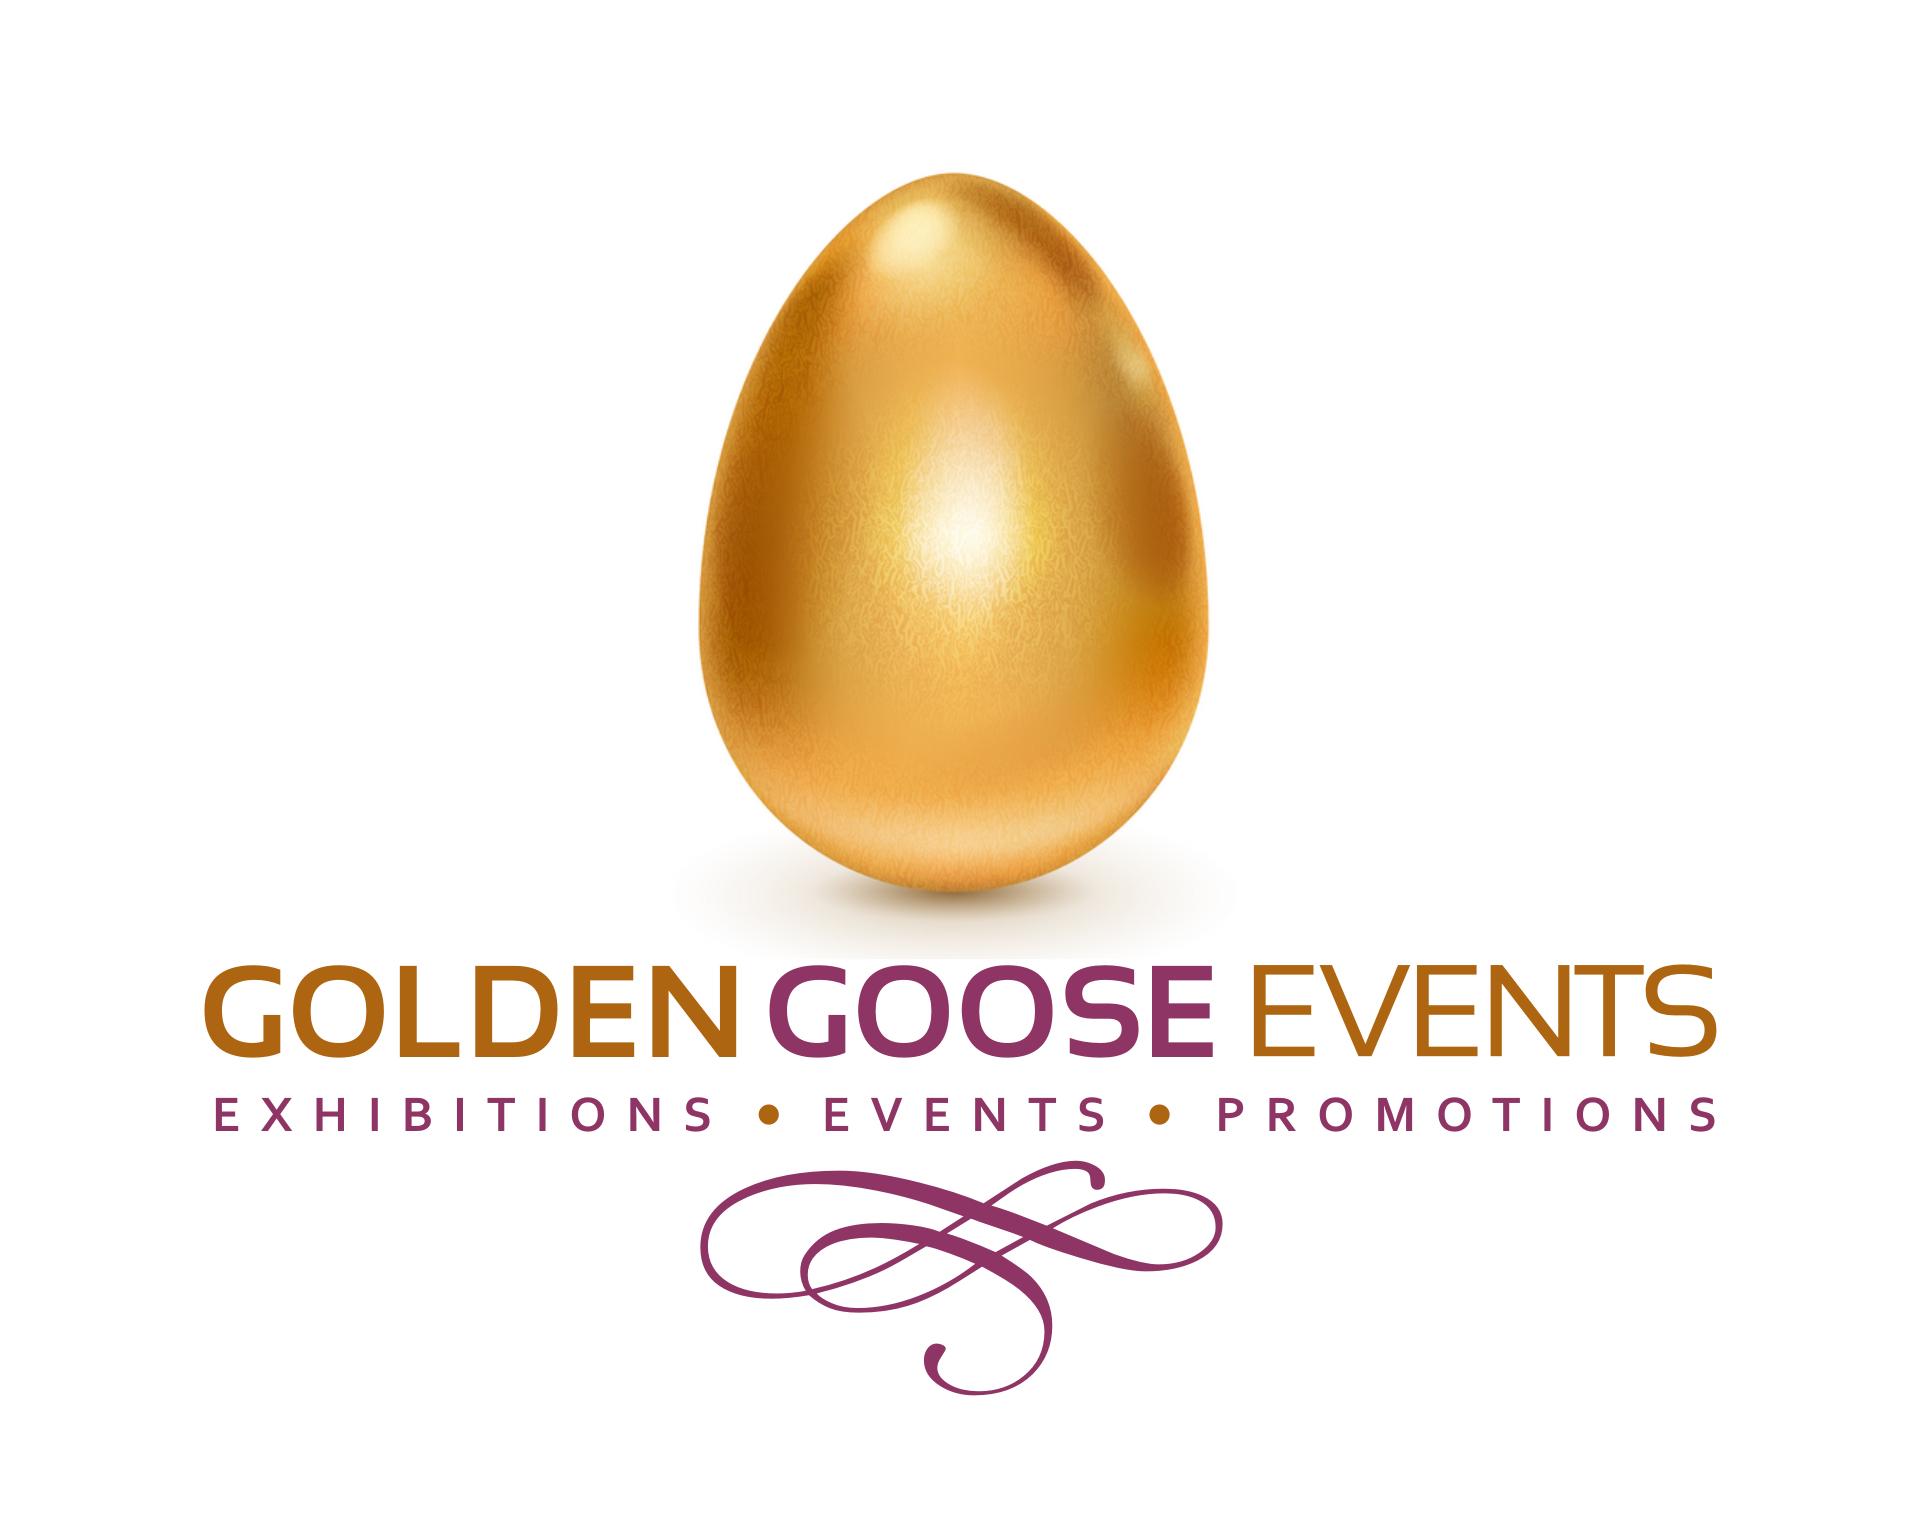 Golden Goose Events